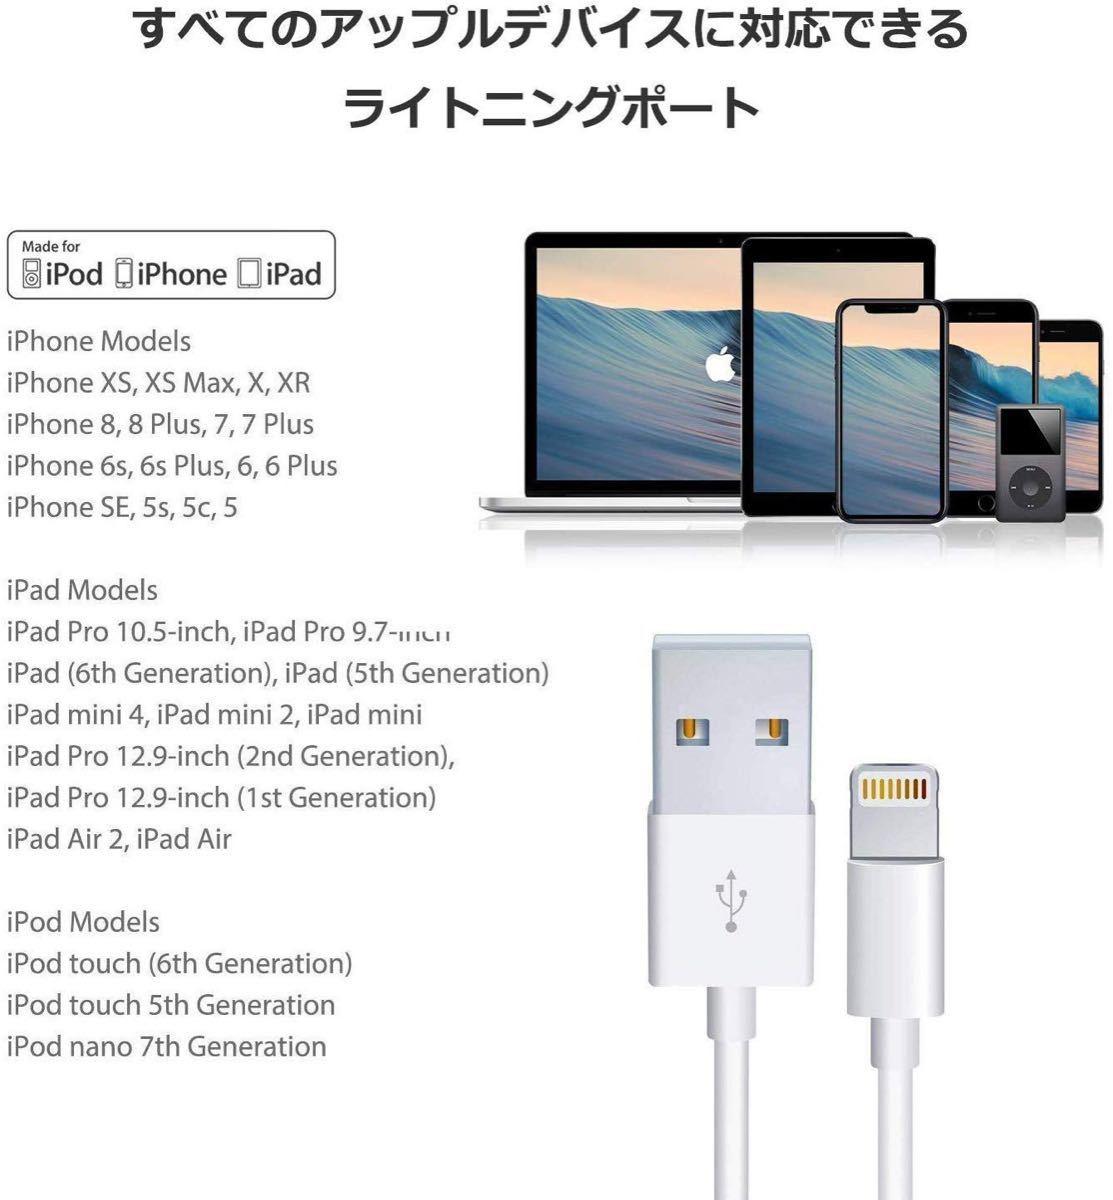 iPhone充電ケーブル Lightningケーブル 急速充電 充電器 純正品質 2m×10本セット